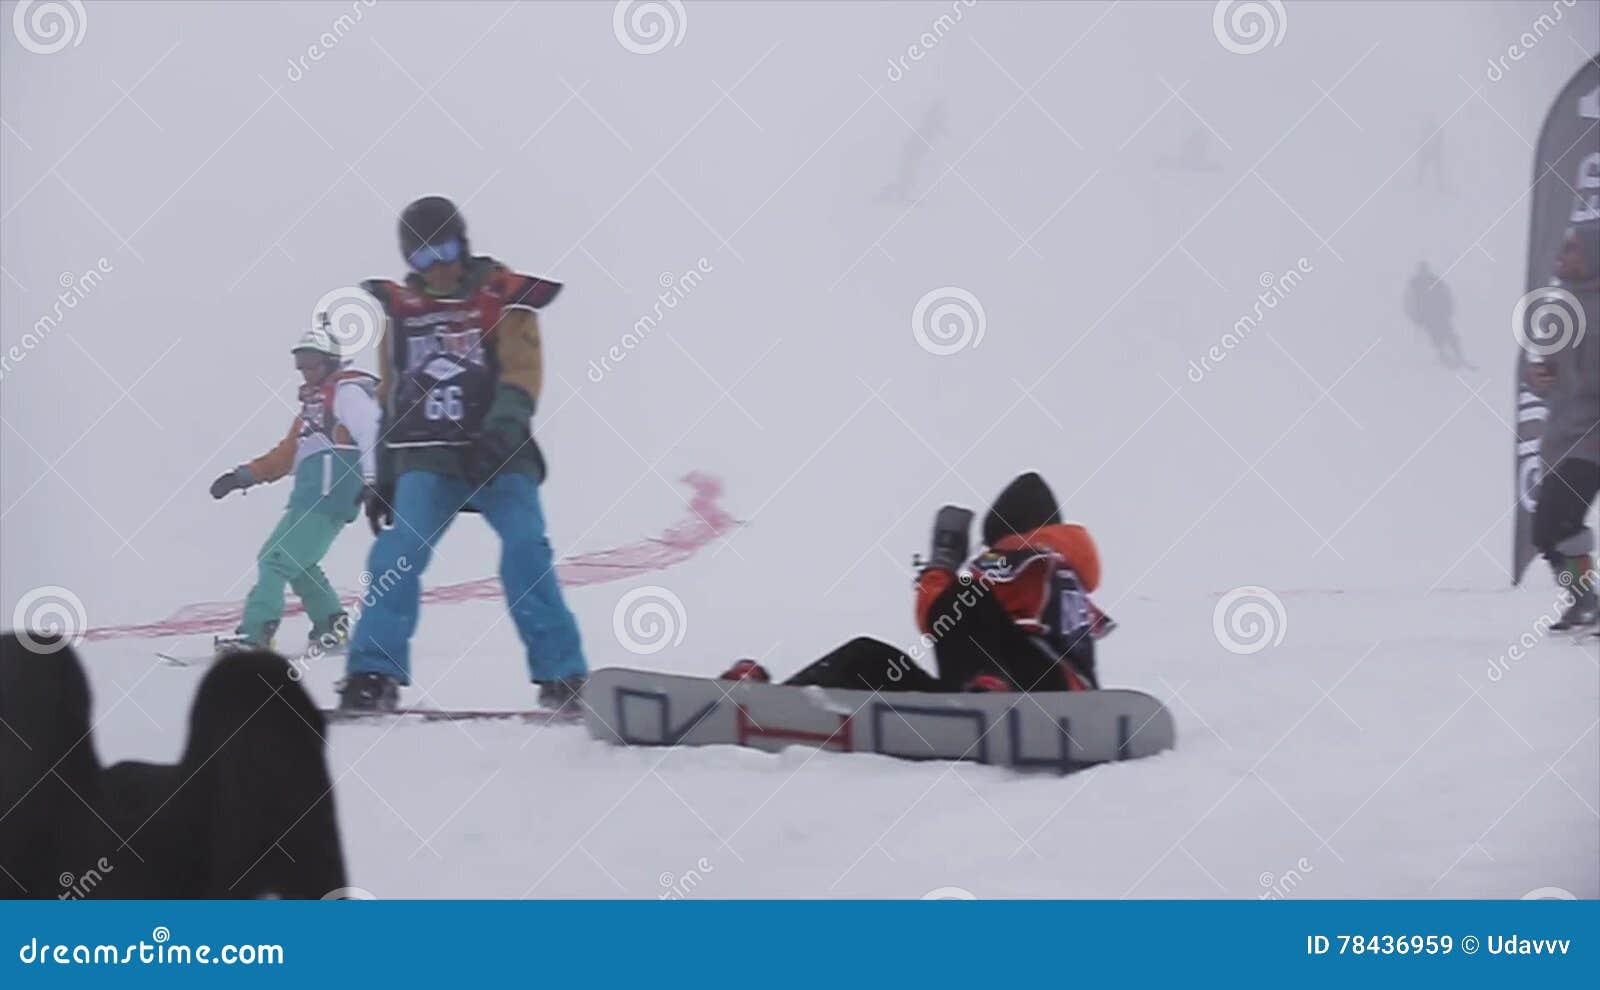 Snowboardersritt på lutning på hastighet fullföljande semesterorten skidar challenge strid arkivfilmer